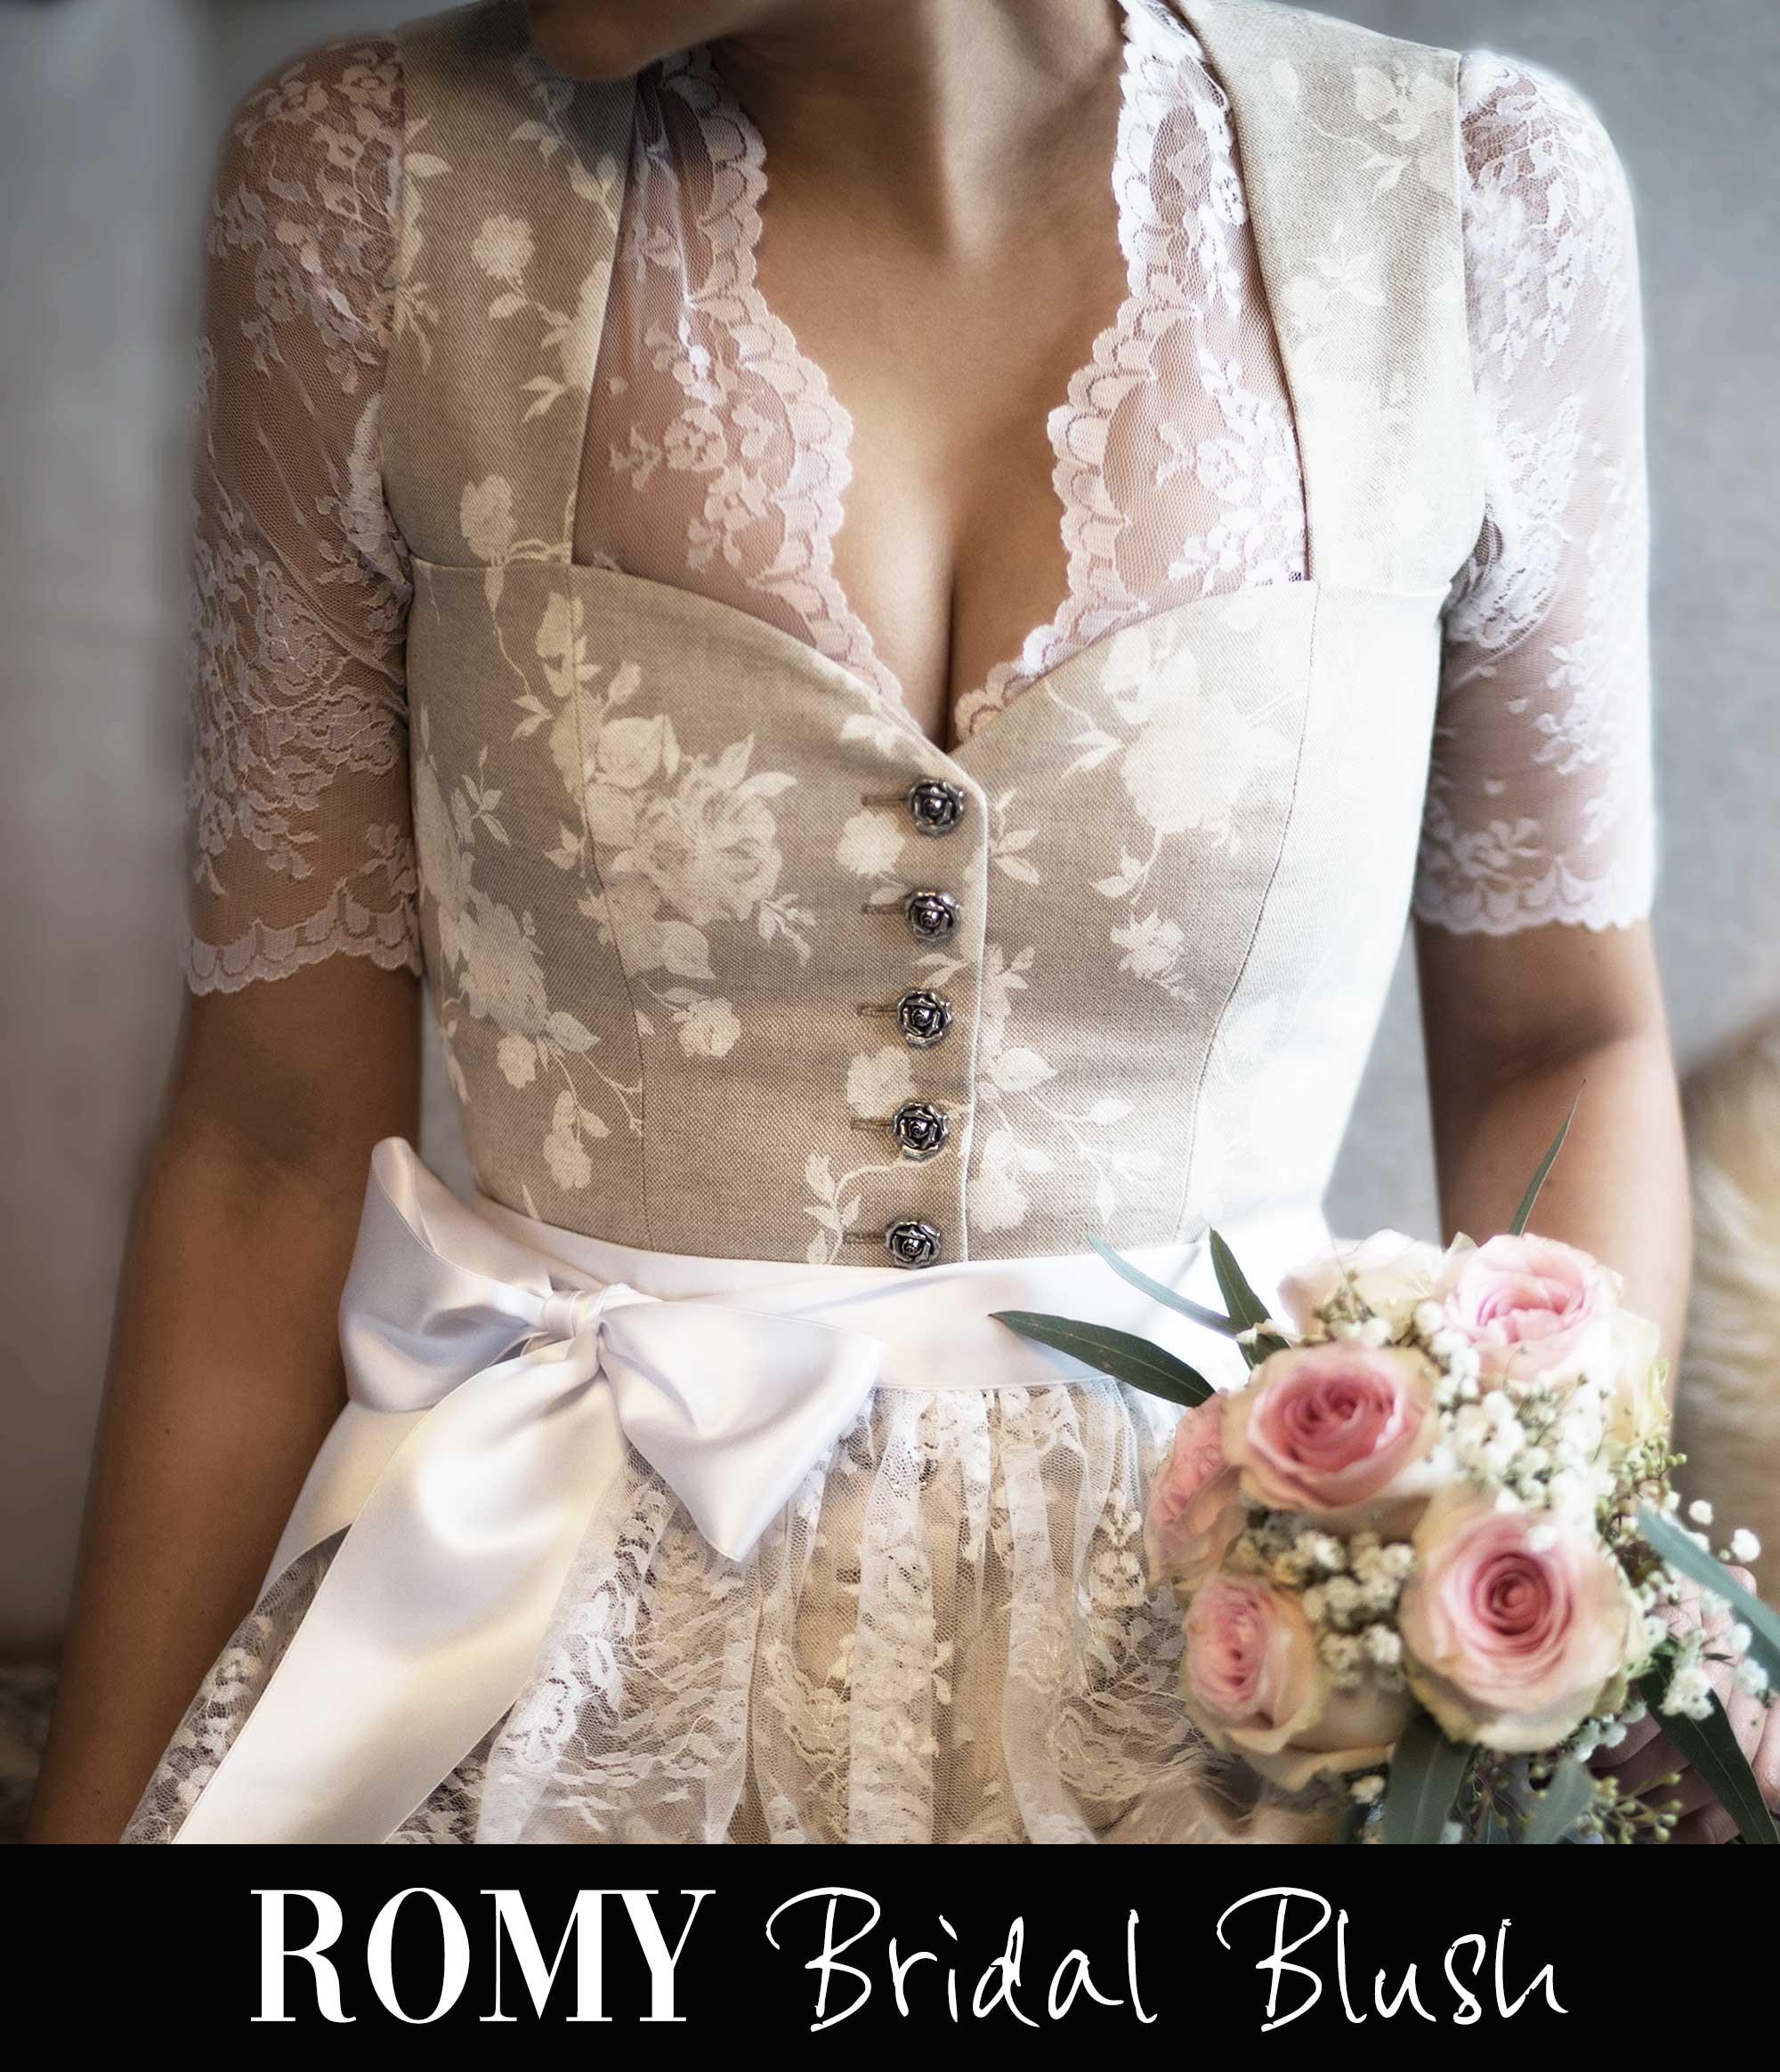 Dirndlkleid ROMY Bridal Blush und Dirndlbluse CÉCILE